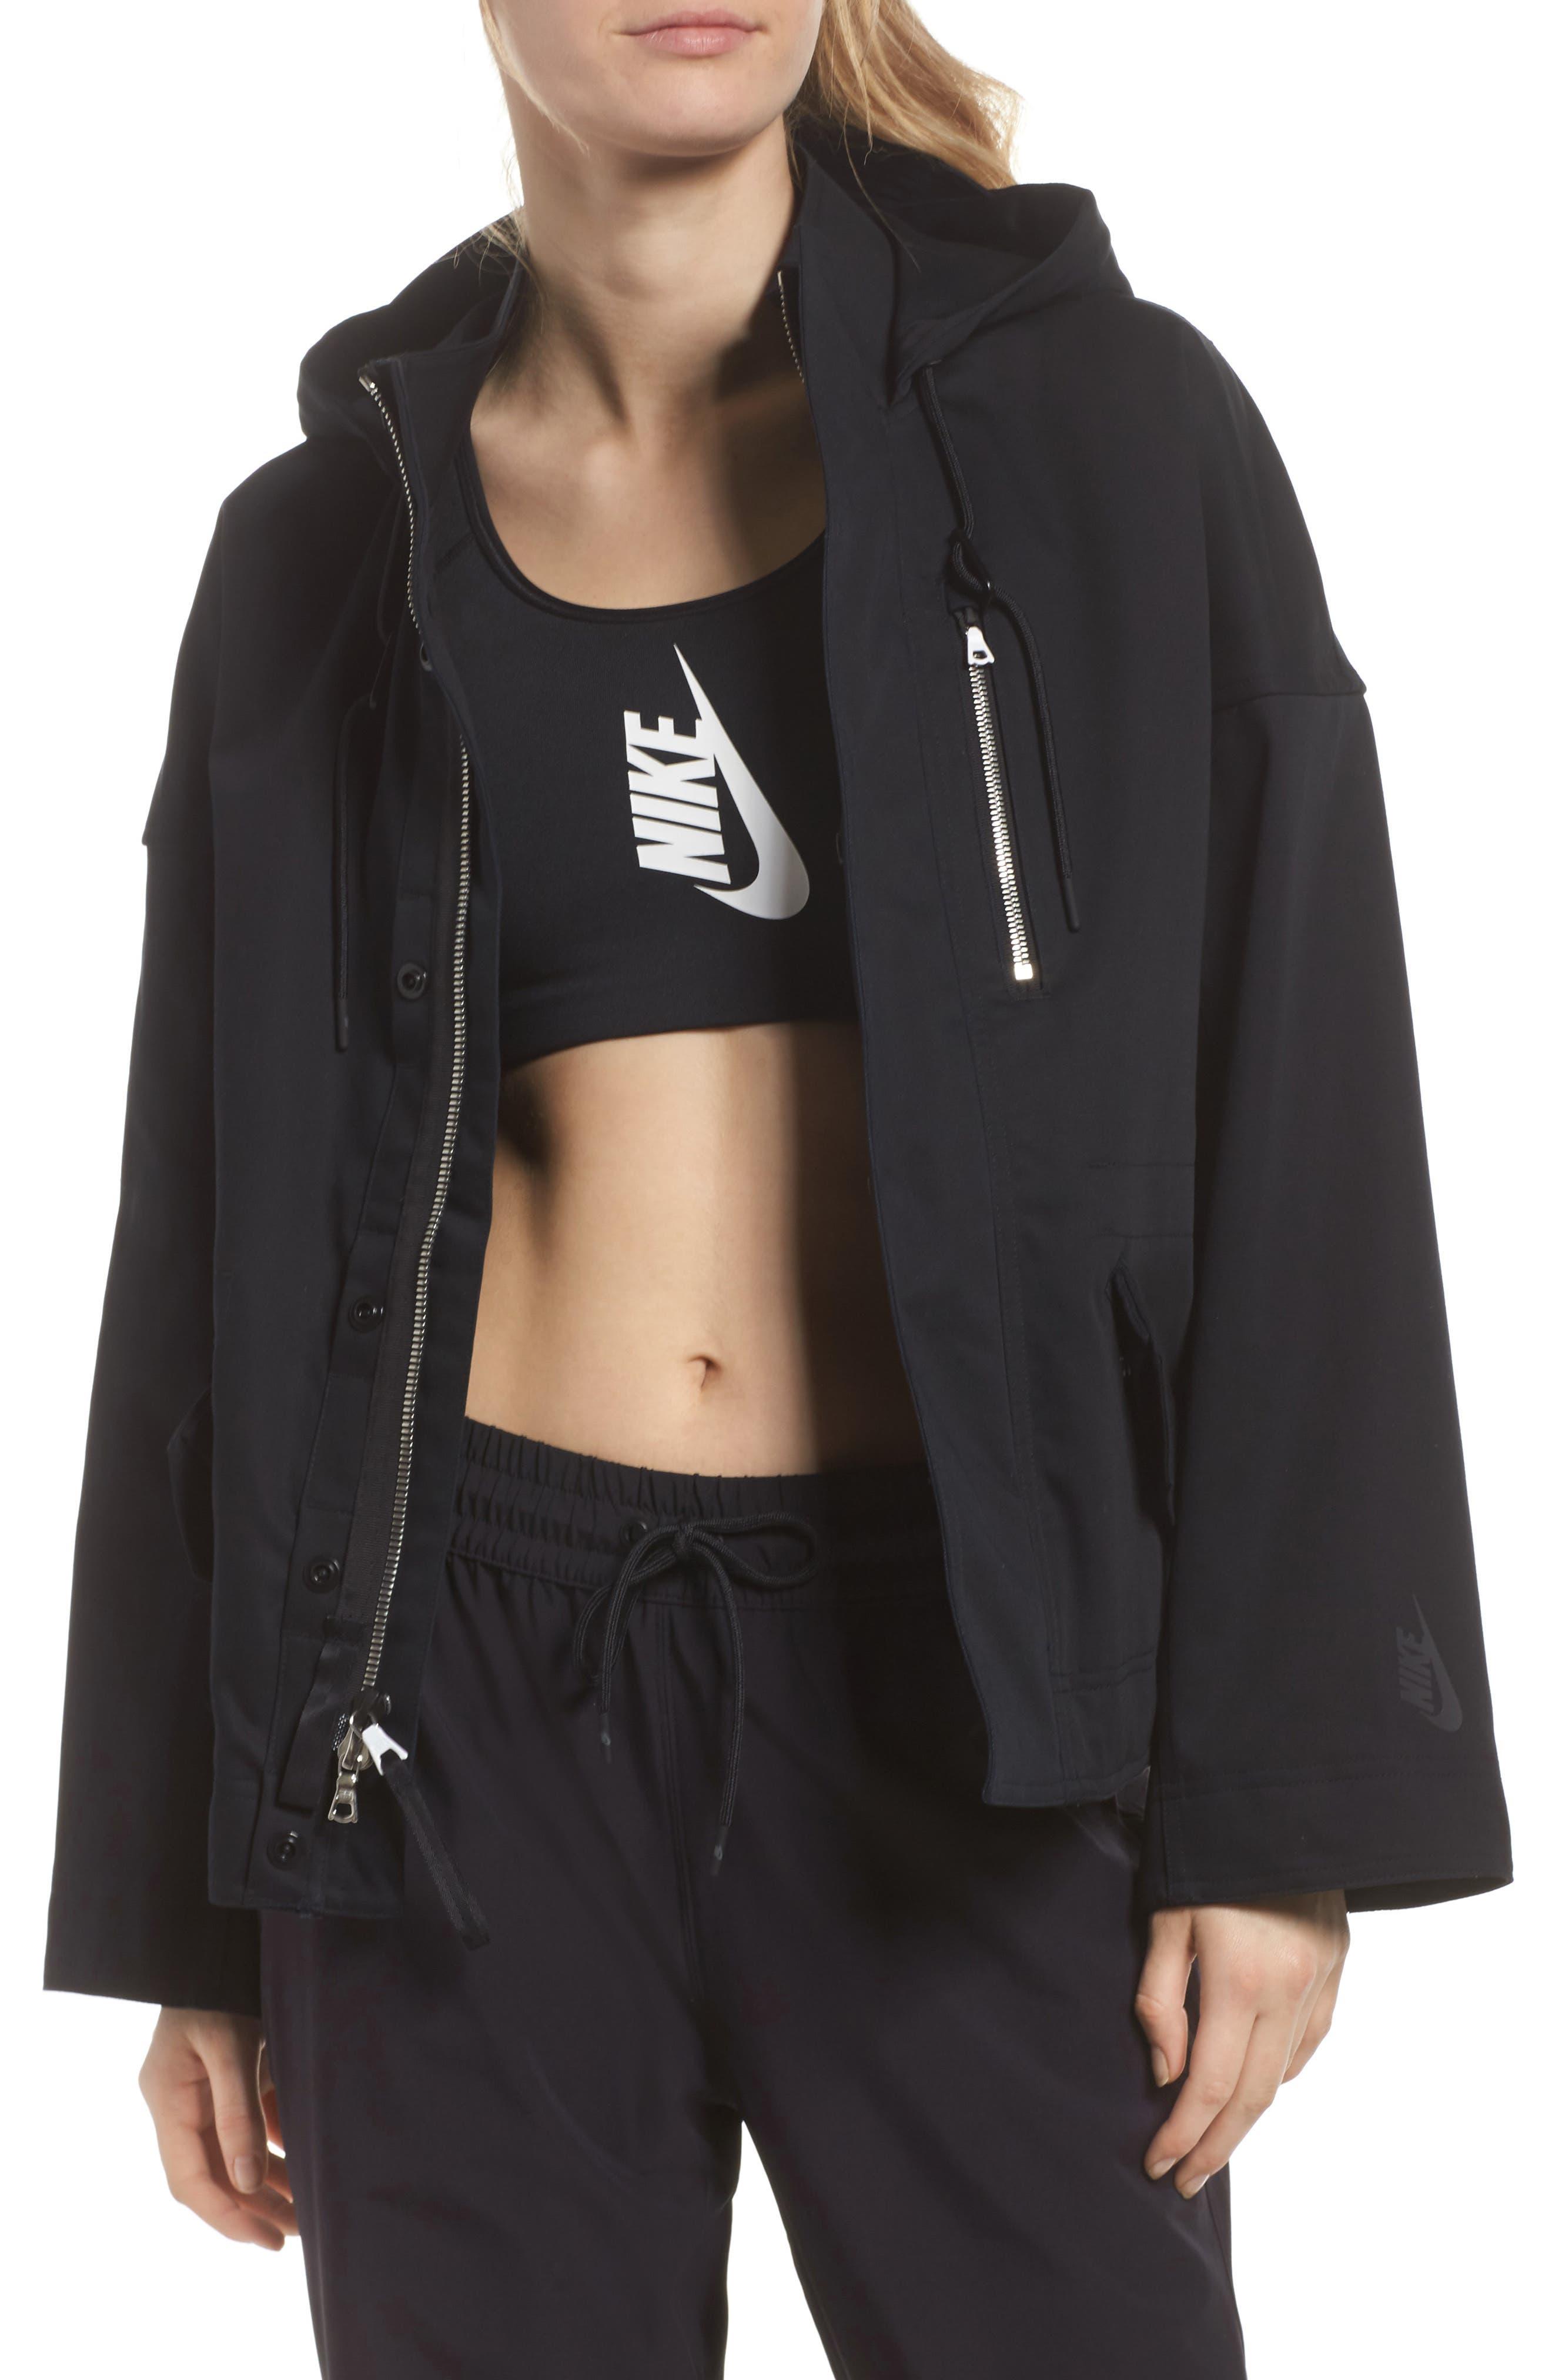 NikeLab Collection Women's Tactical Jacket,                         Main,                         color, Black/ Black